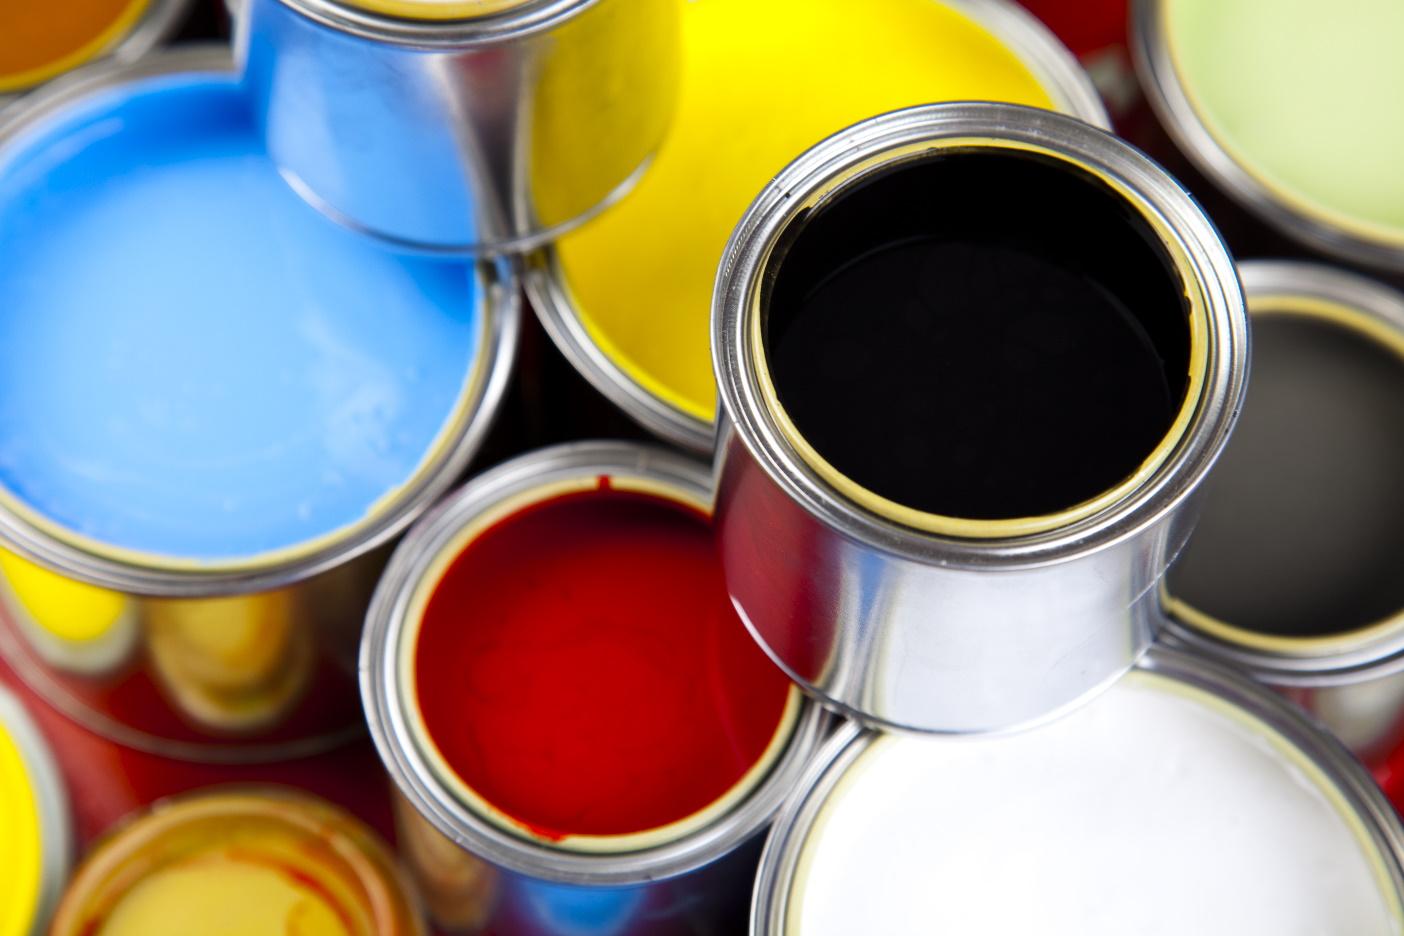 plechovky barev tisk label design